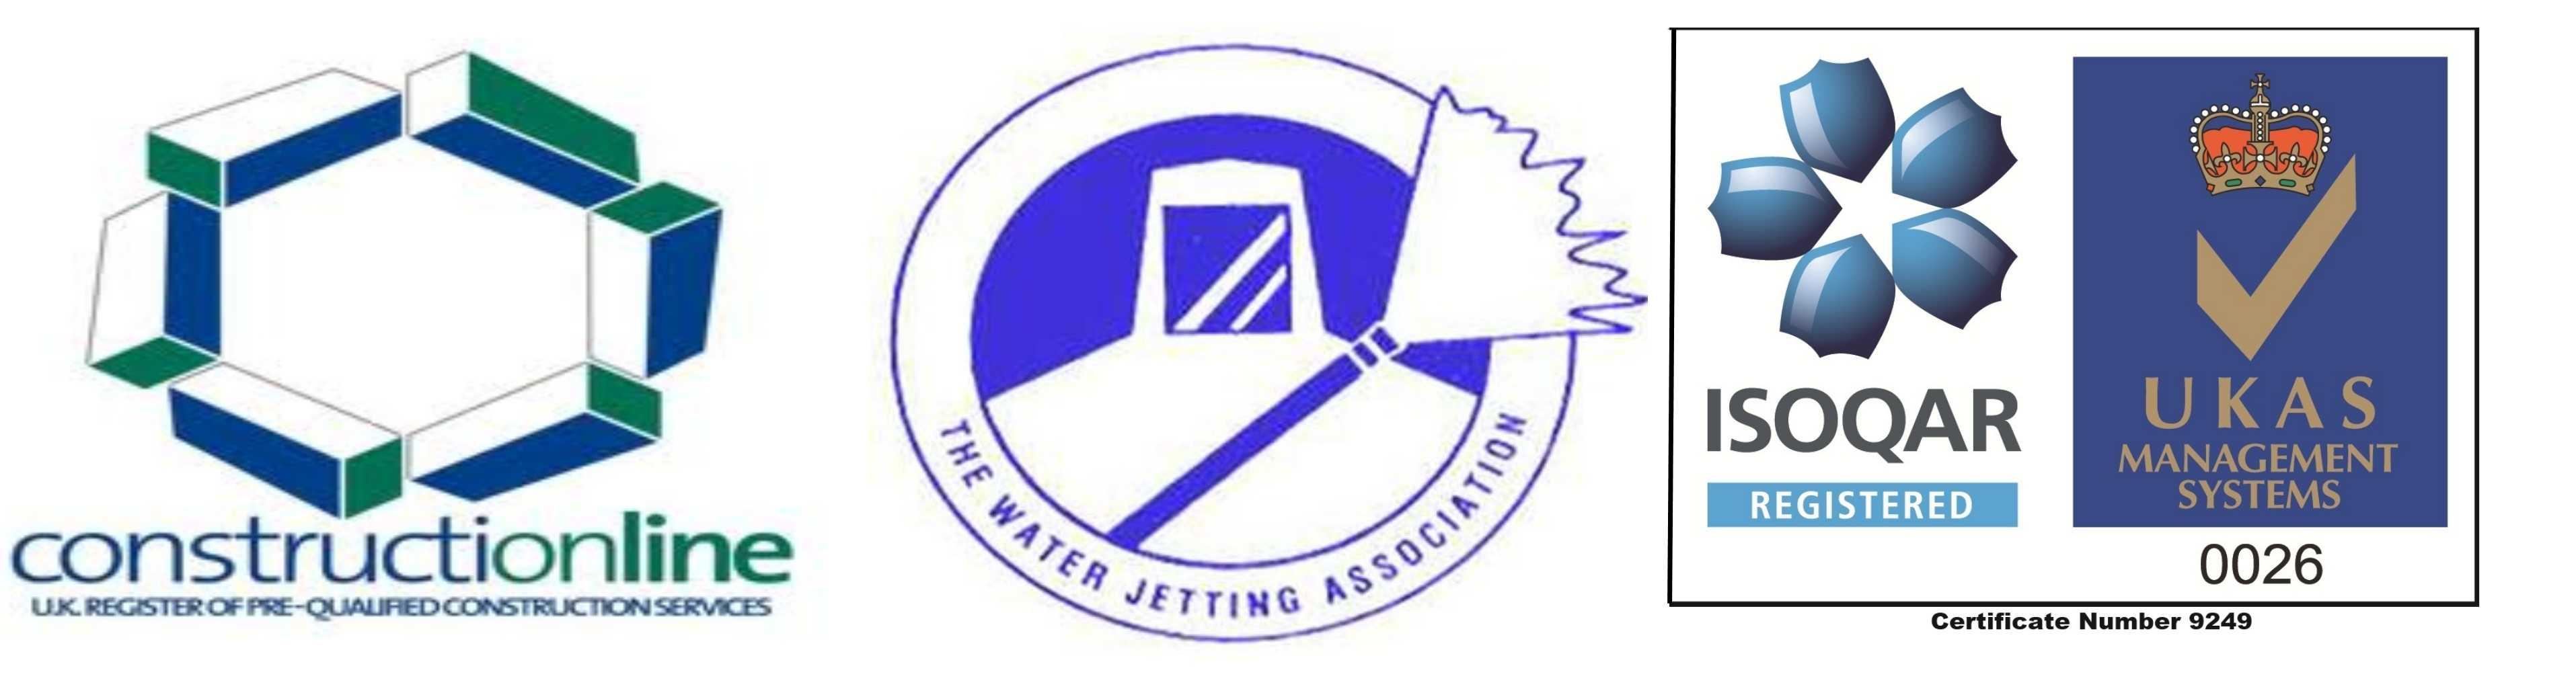 Airloads Accreditation logos